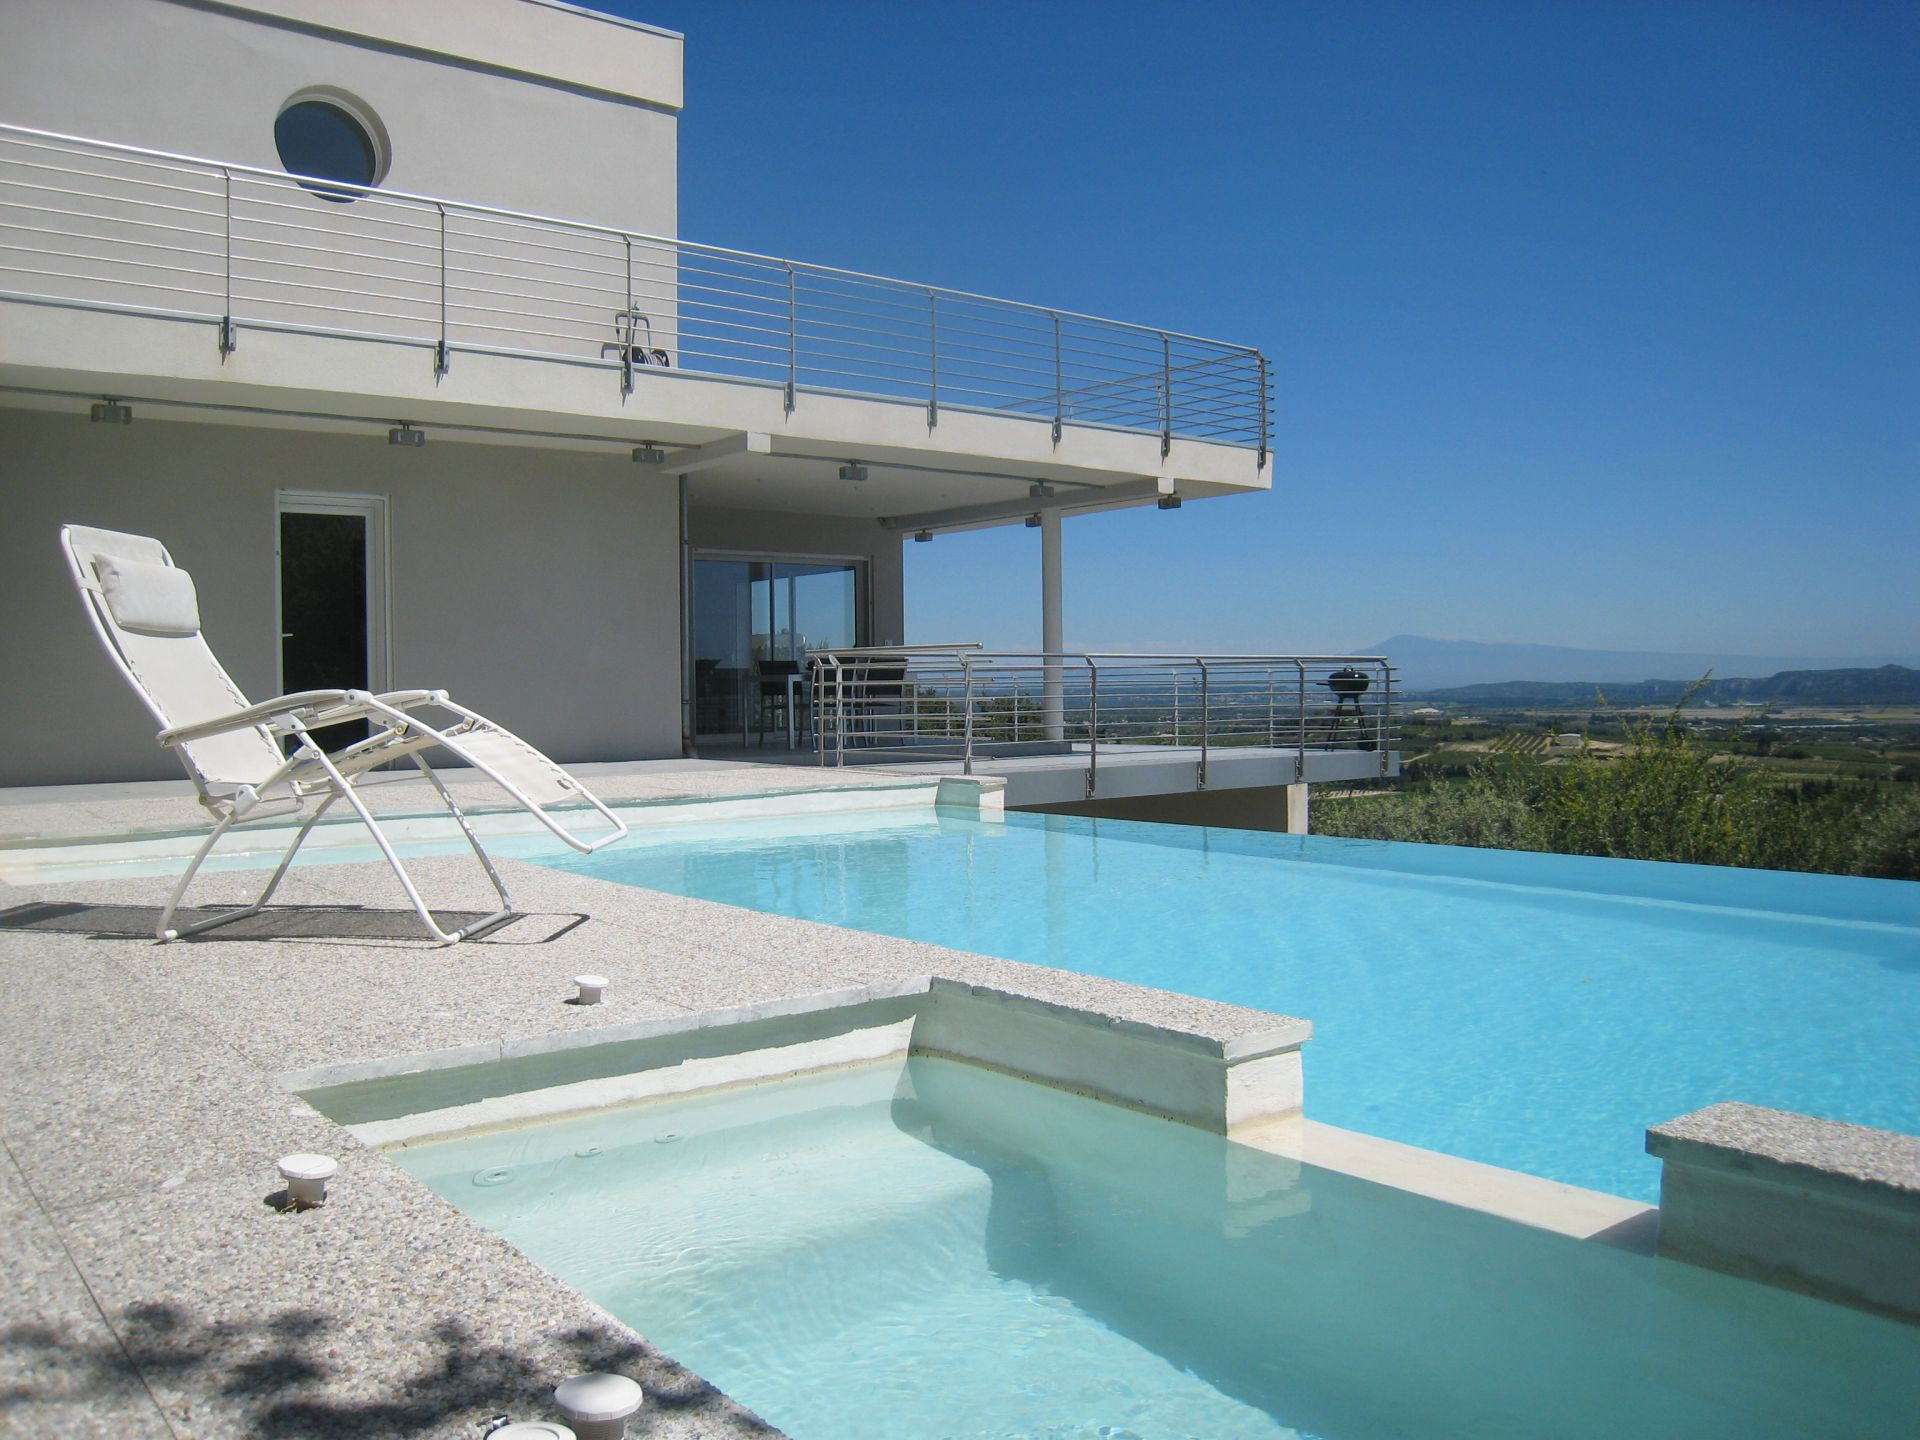 Provencale avec piscine toit plat tendance for Toit de piscine